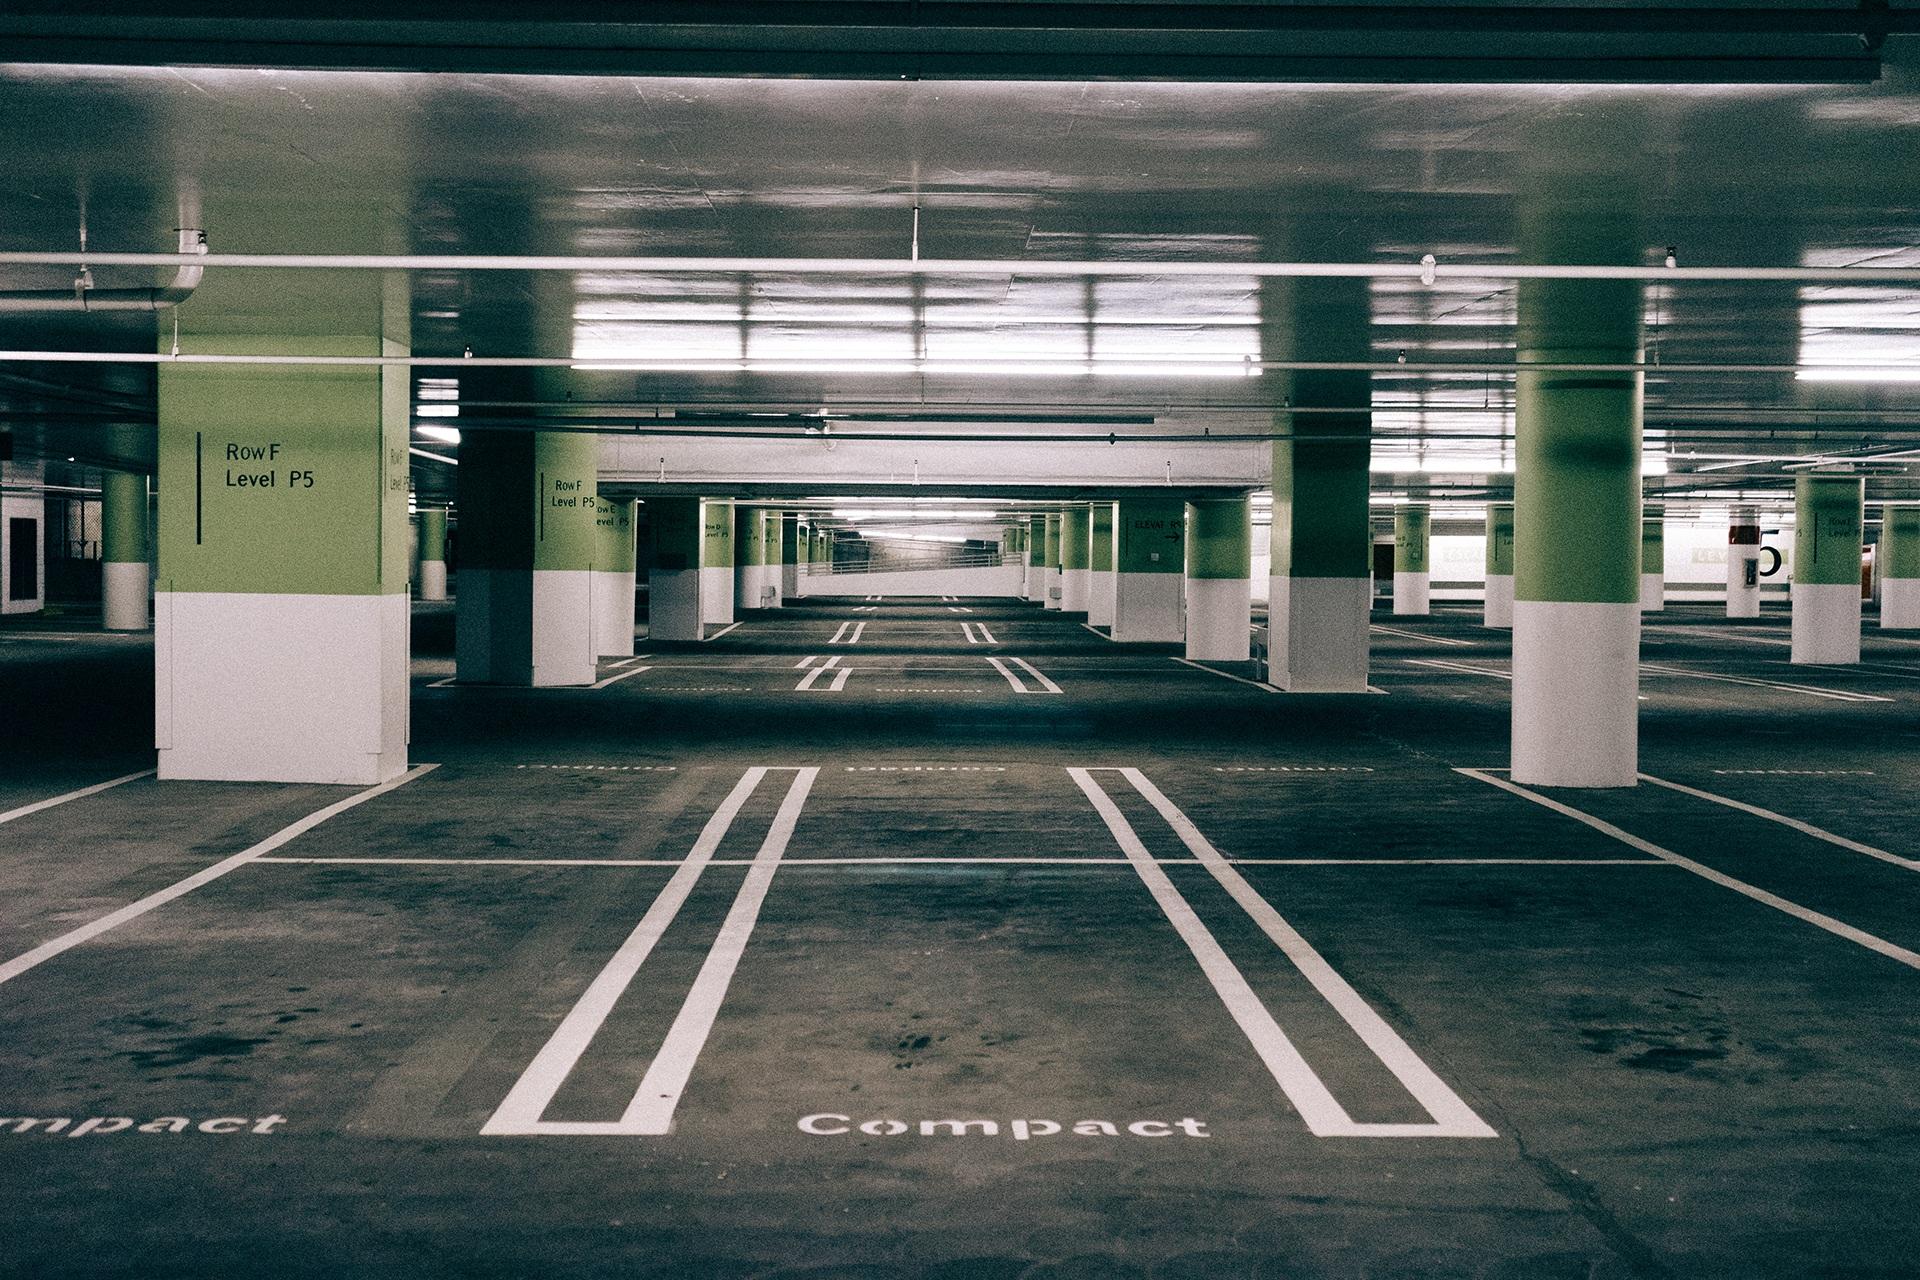 free images architecture traffic city asphalt subway